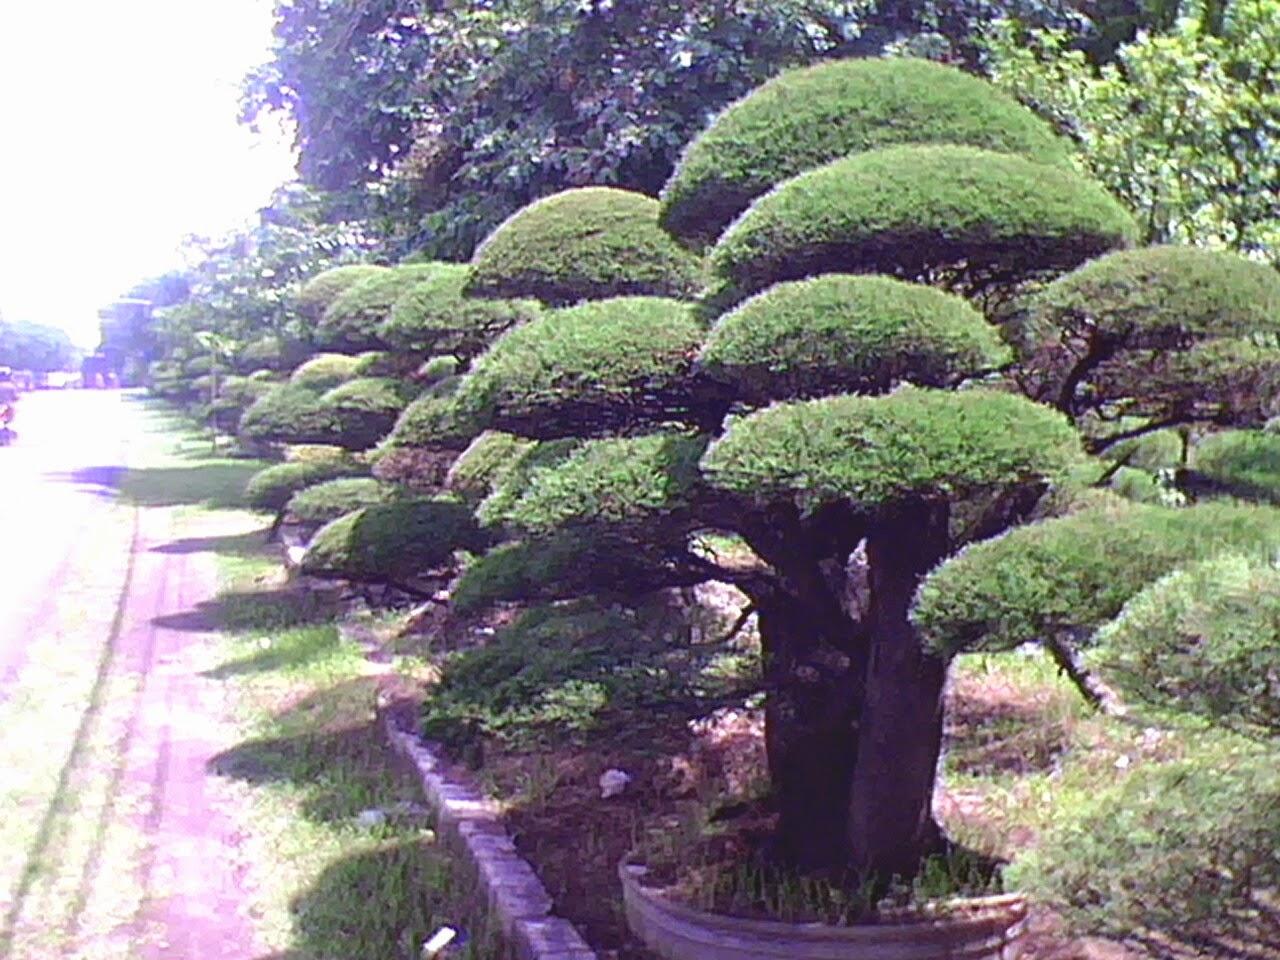 Koleksi Tanaman Hias Pohon Cemara Udang Casuarina Equisetifolia